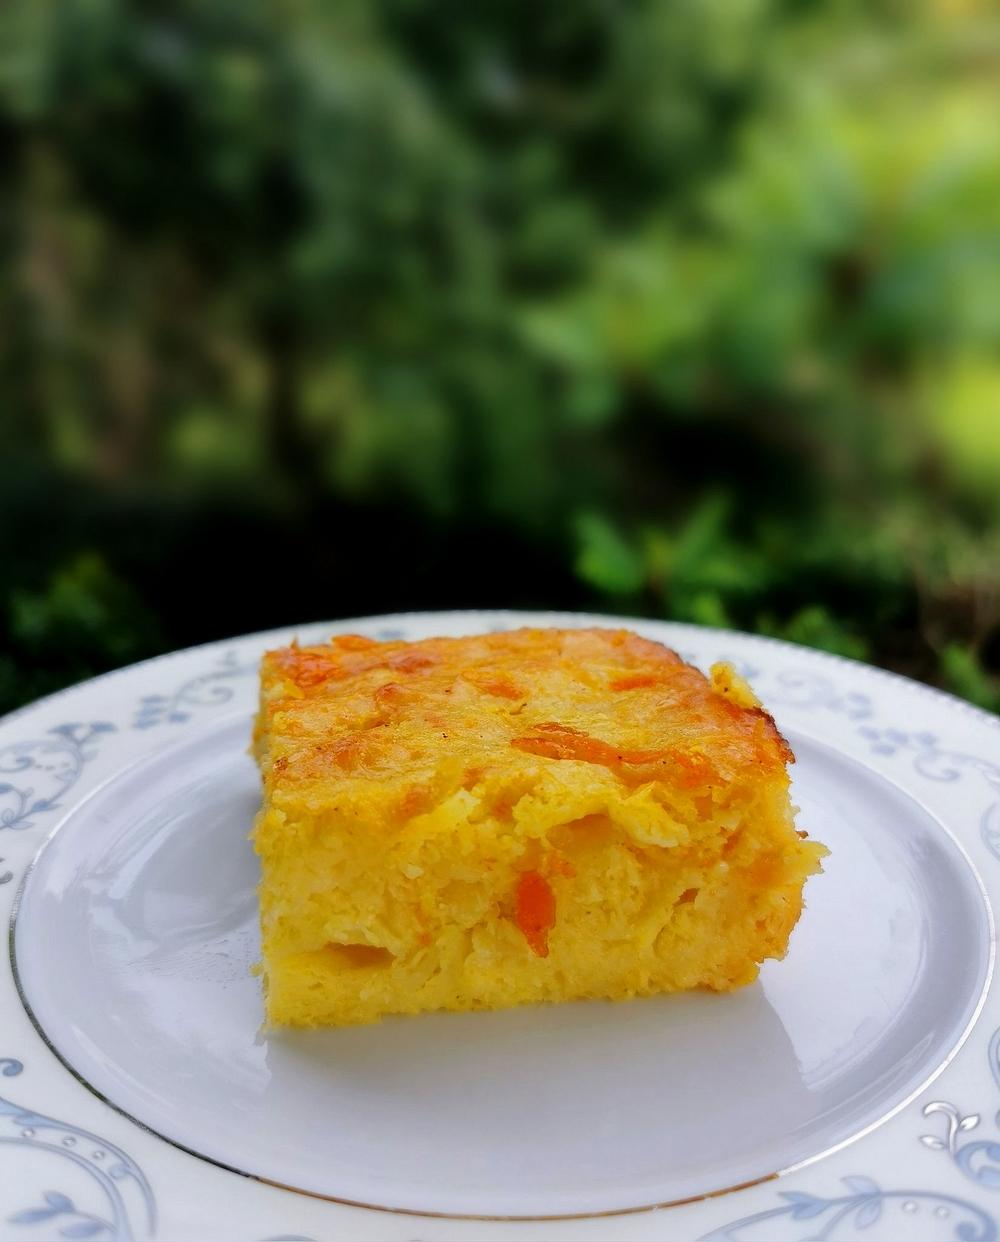 Portokalopita, gâteau grec à l'orange